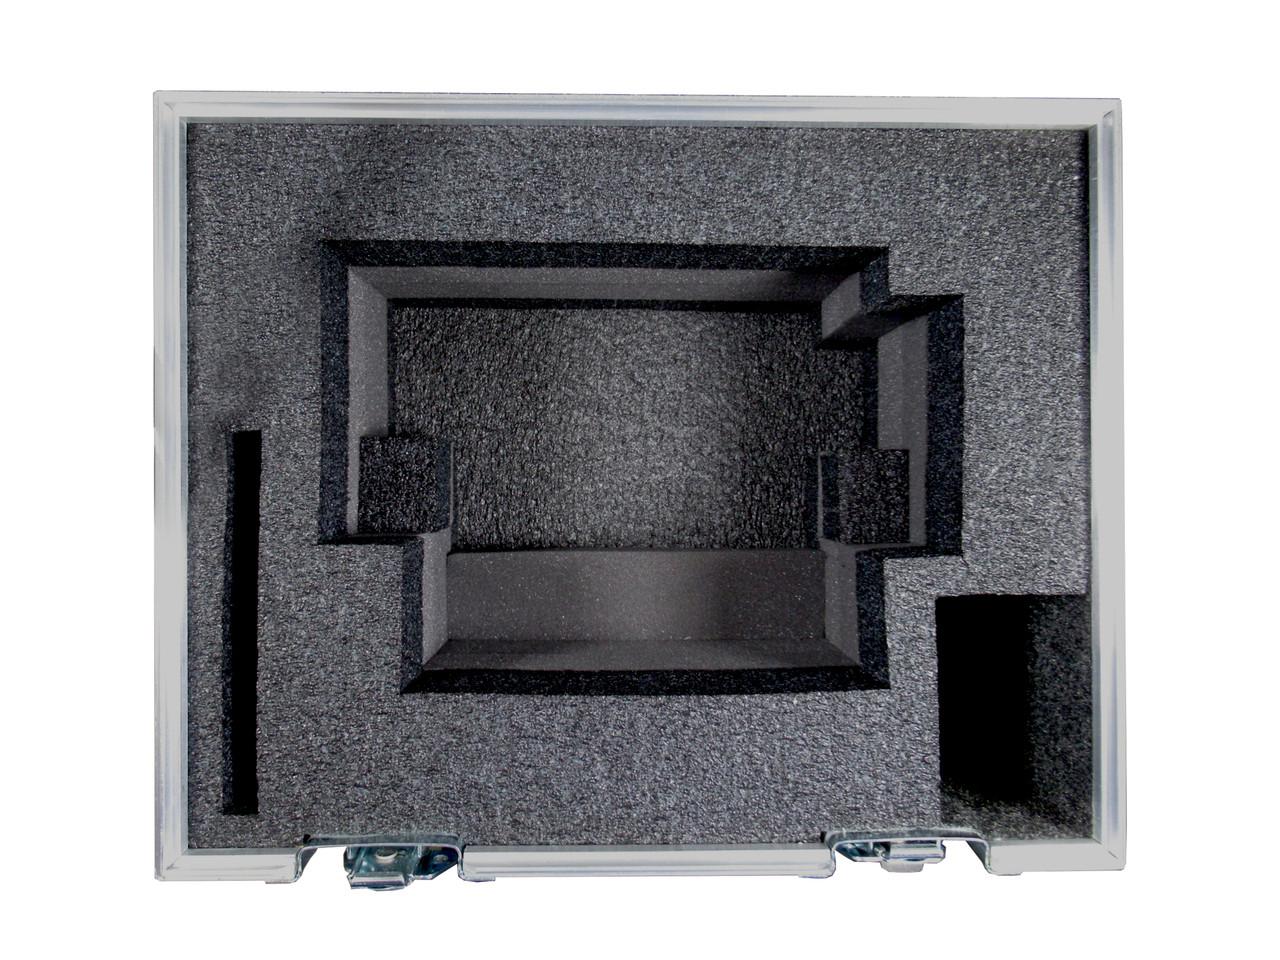 Schneider Optics Super Wide Low Angle Prism